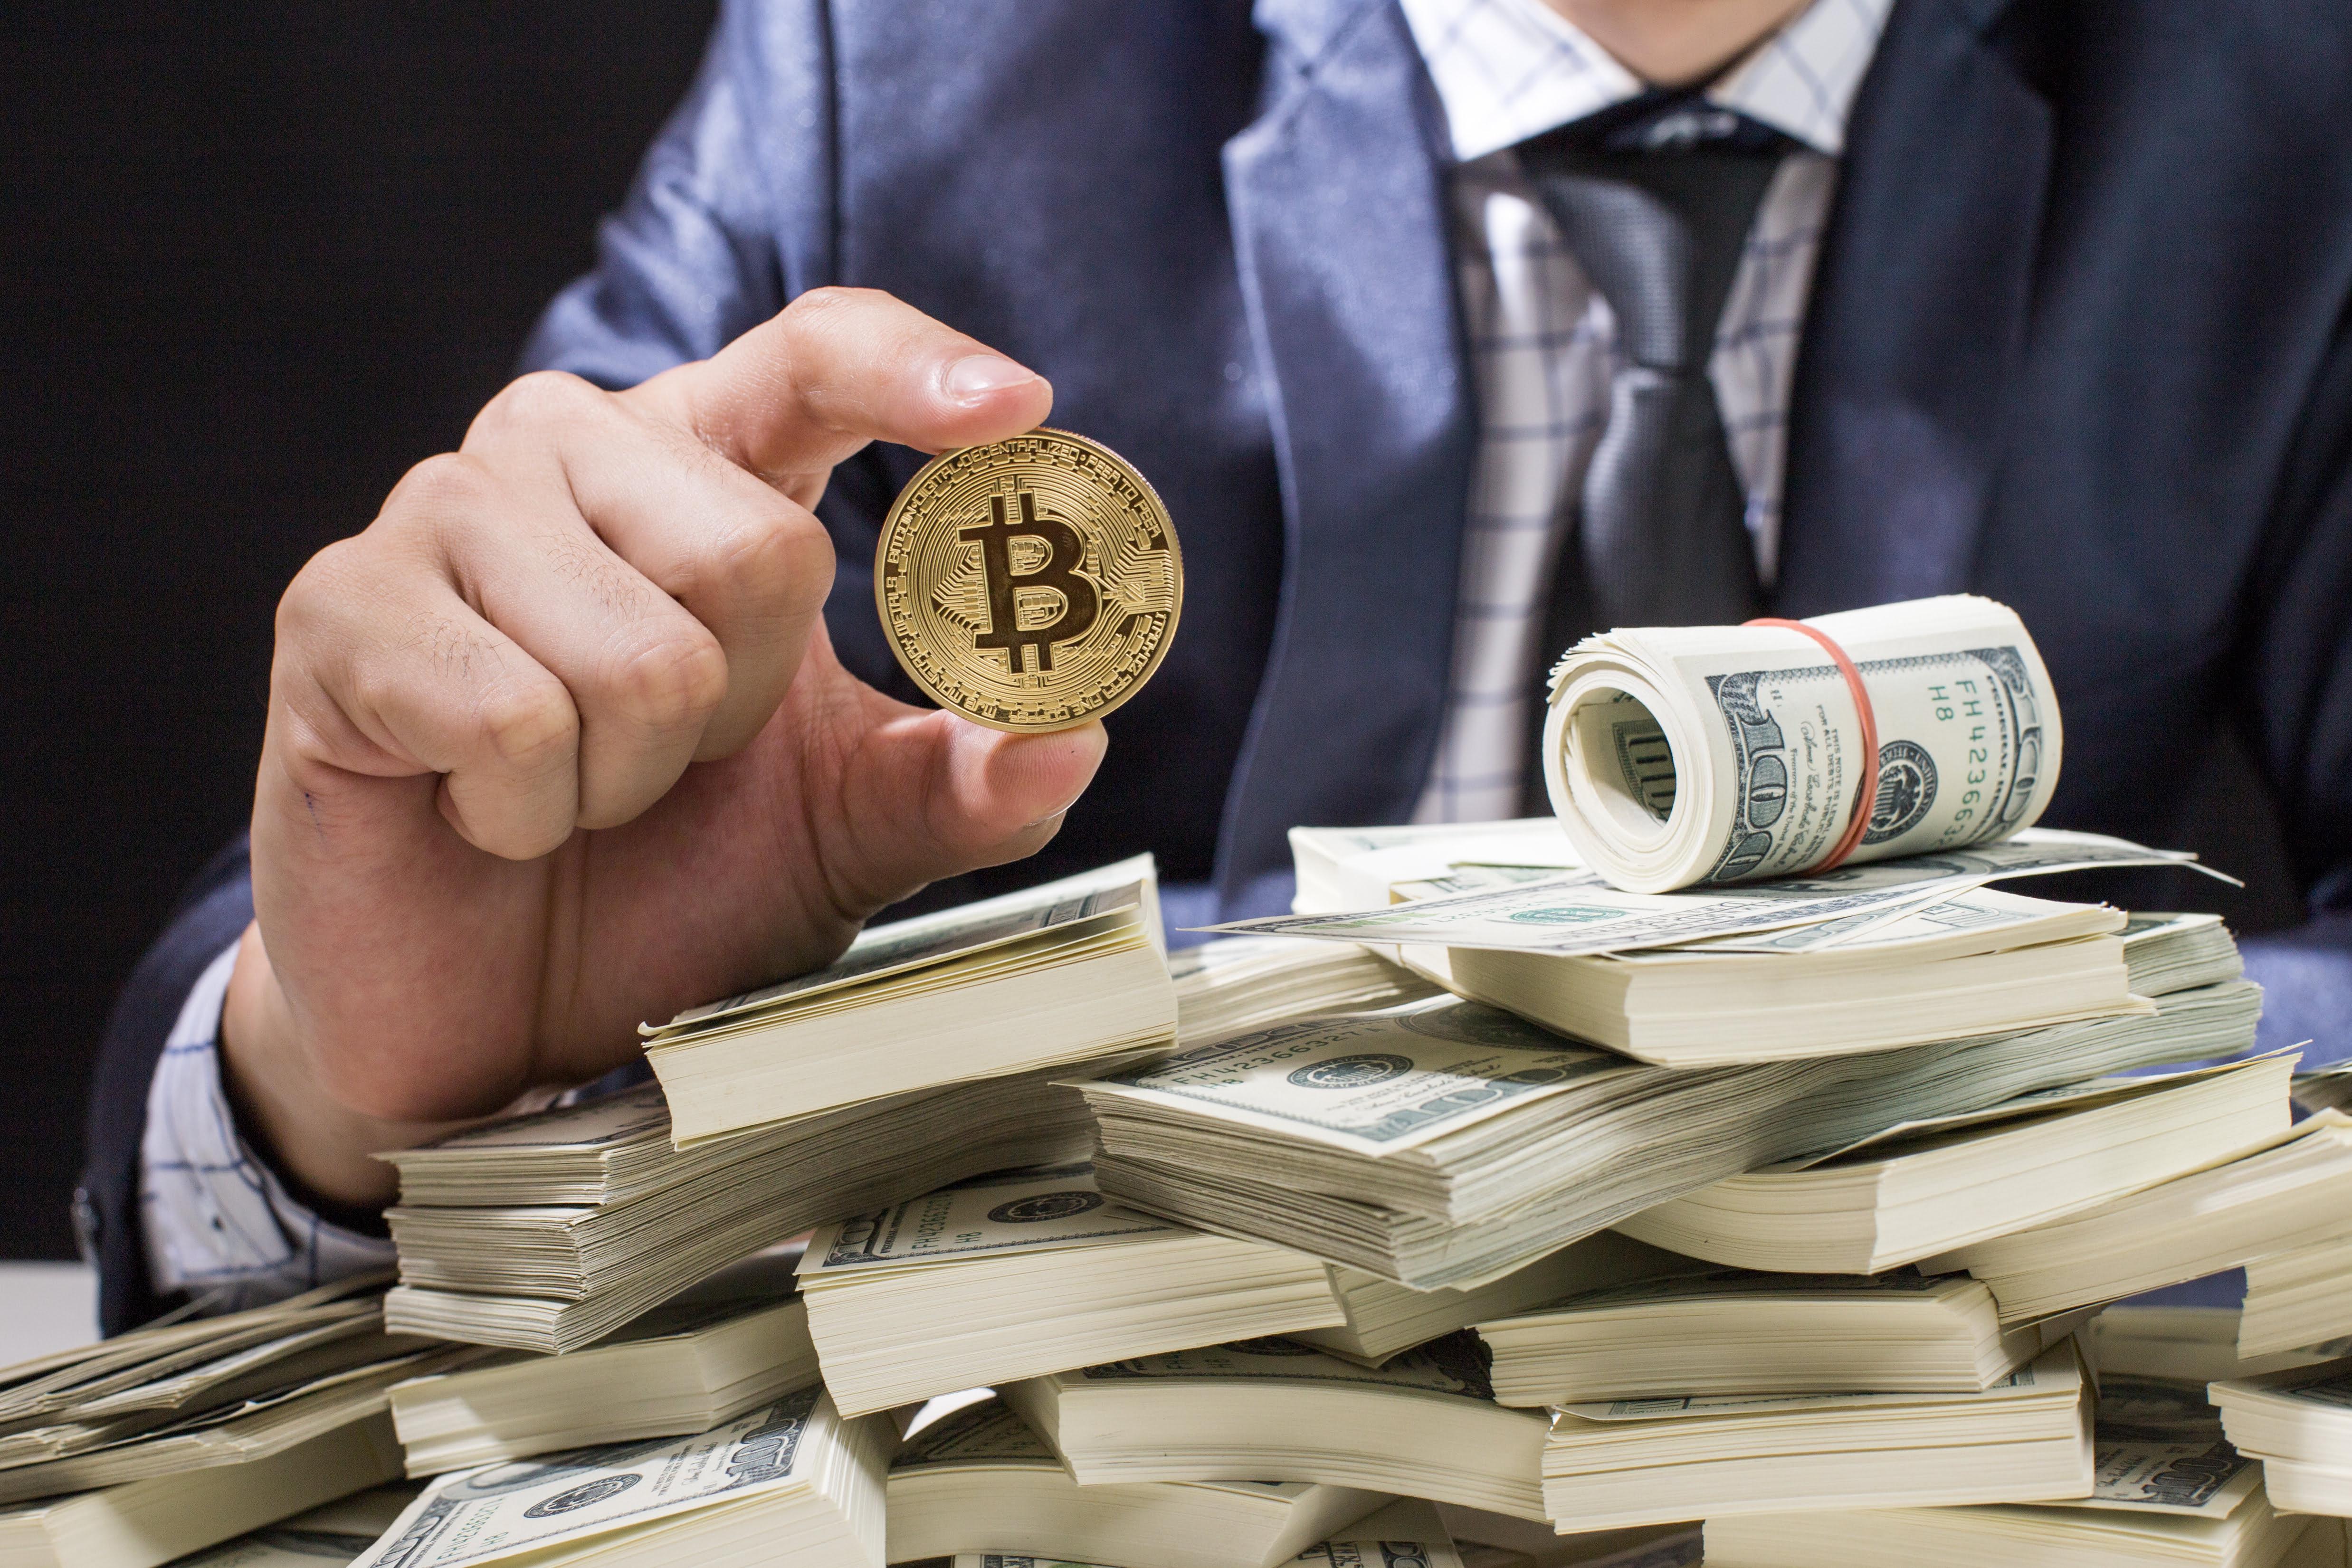 Bitcoin Investors Still Bullish: Data Indicates Almost 80% Remain Long on BTC